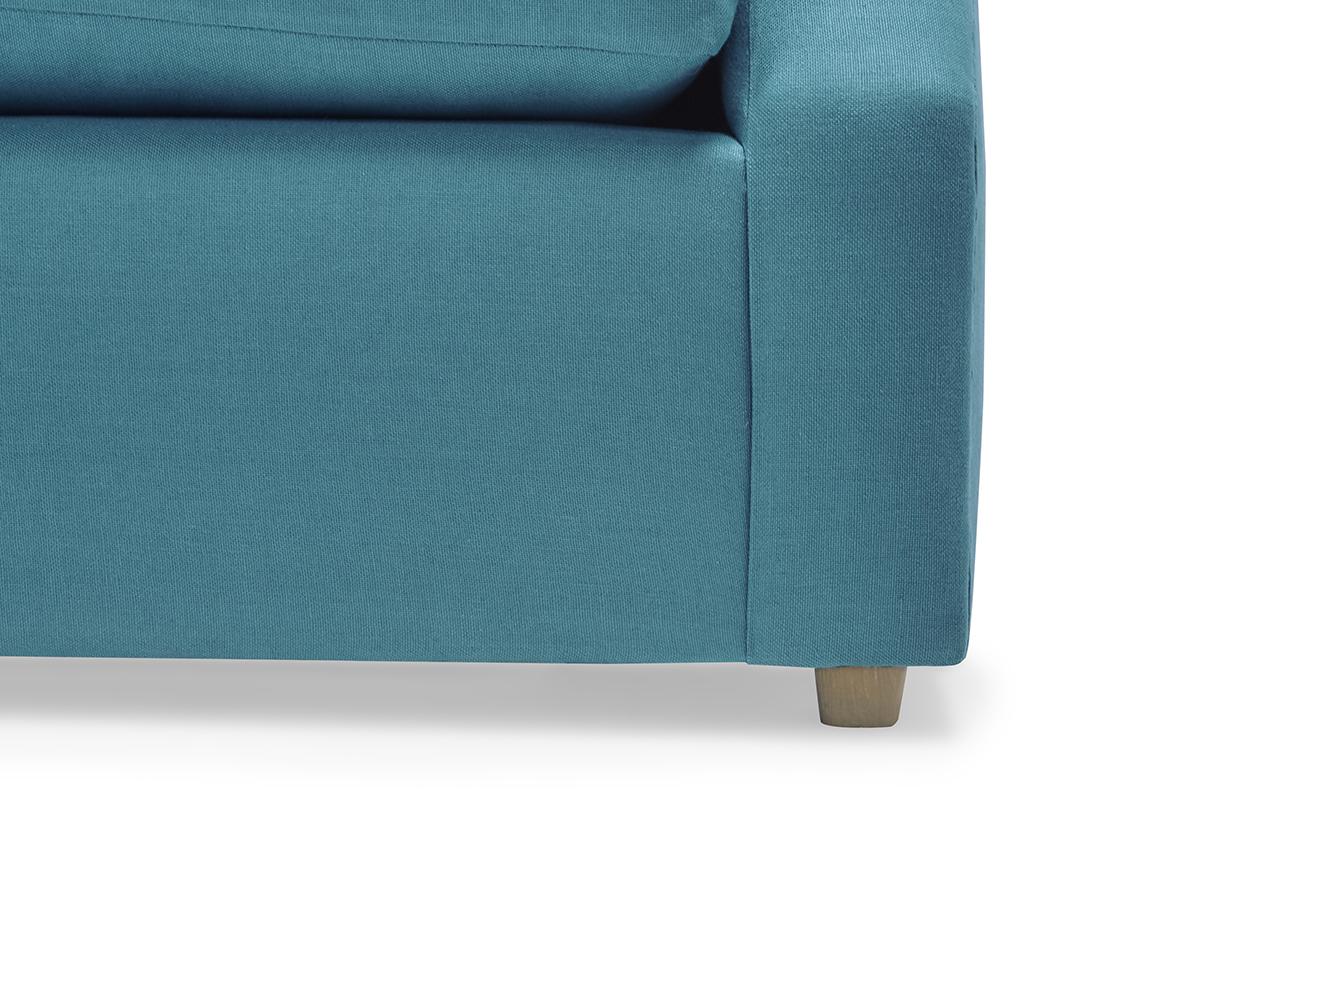 Awe Inspiring Large Crumpet Sofa Bed In Thatch House Fabric Uwap Interior Chair Design Uwaporg